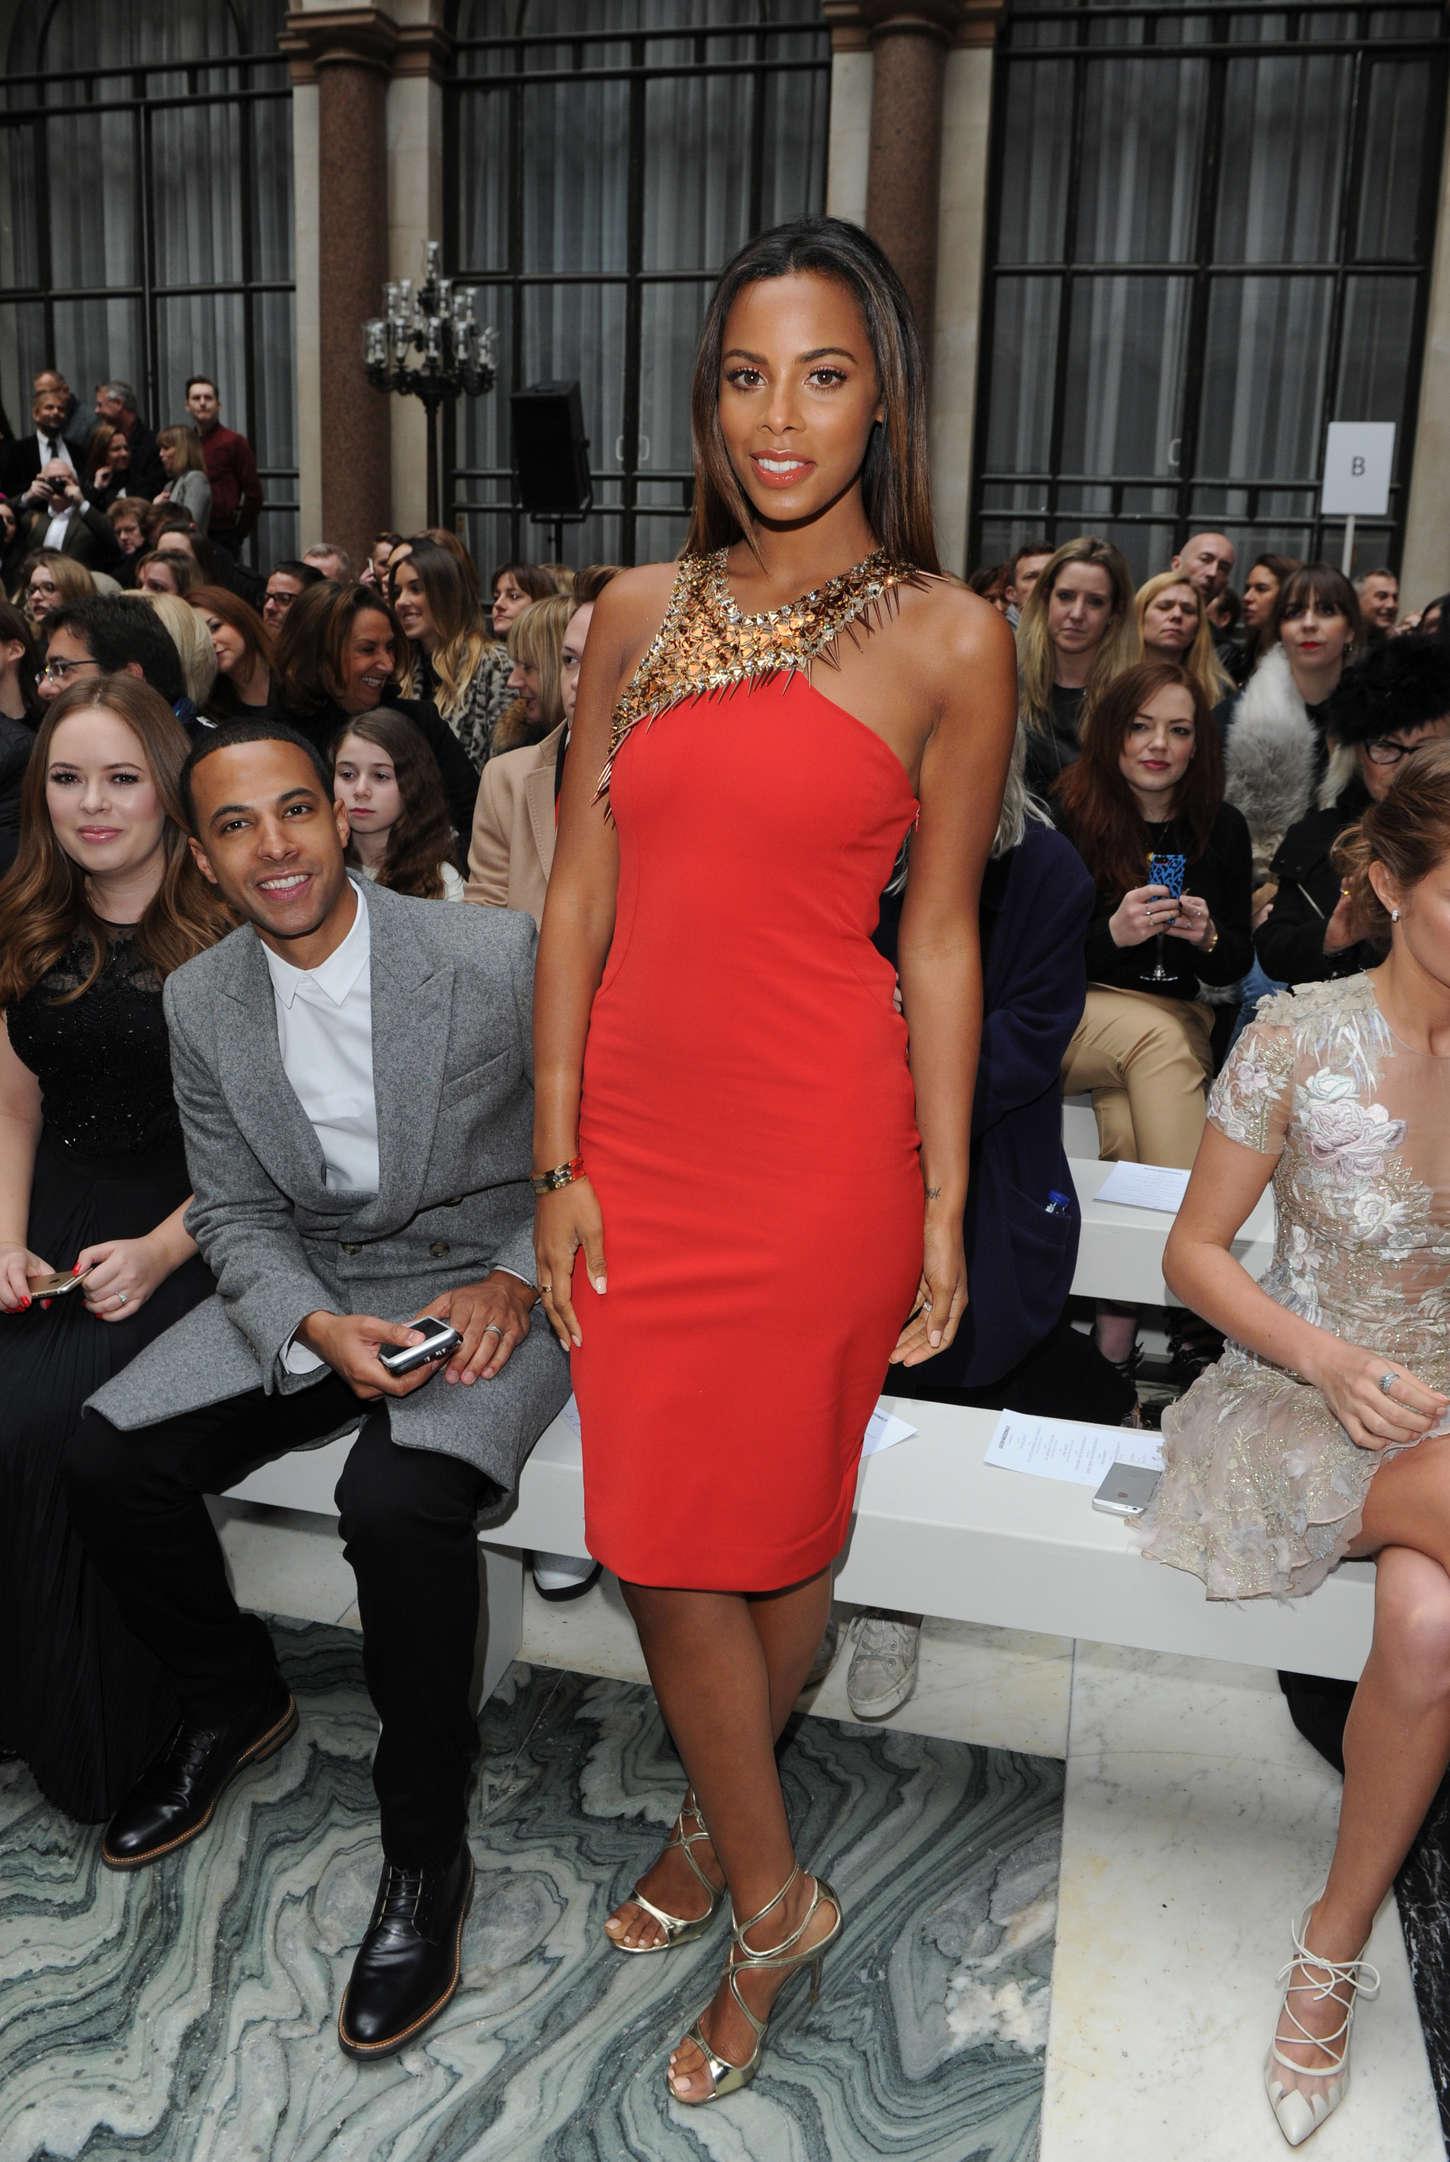 Rochelle Humes Julien Macdonald Fashion Show in London